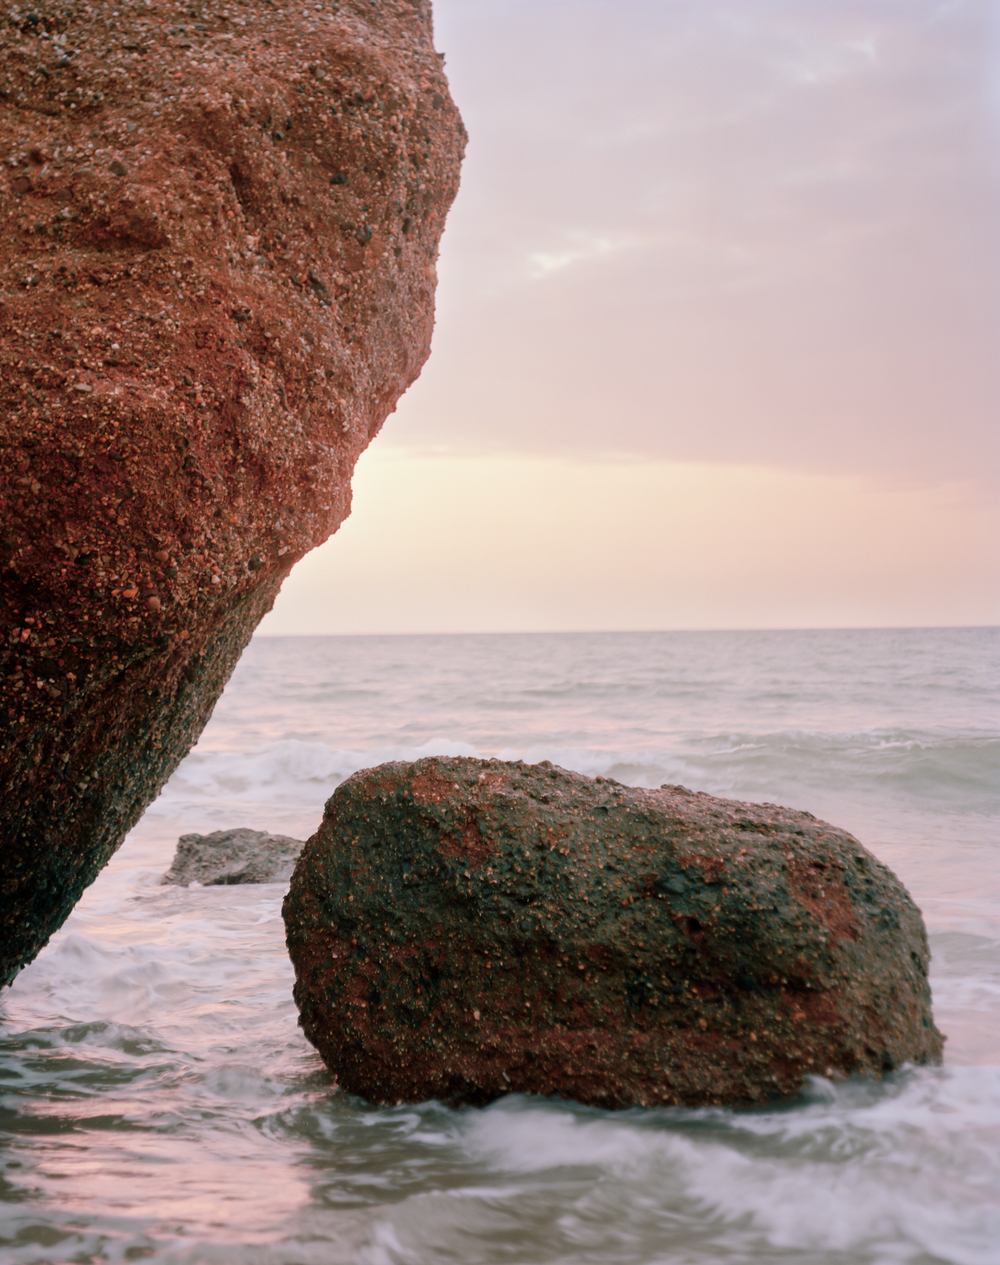 019 lucy vinent cliffs copy.jpg